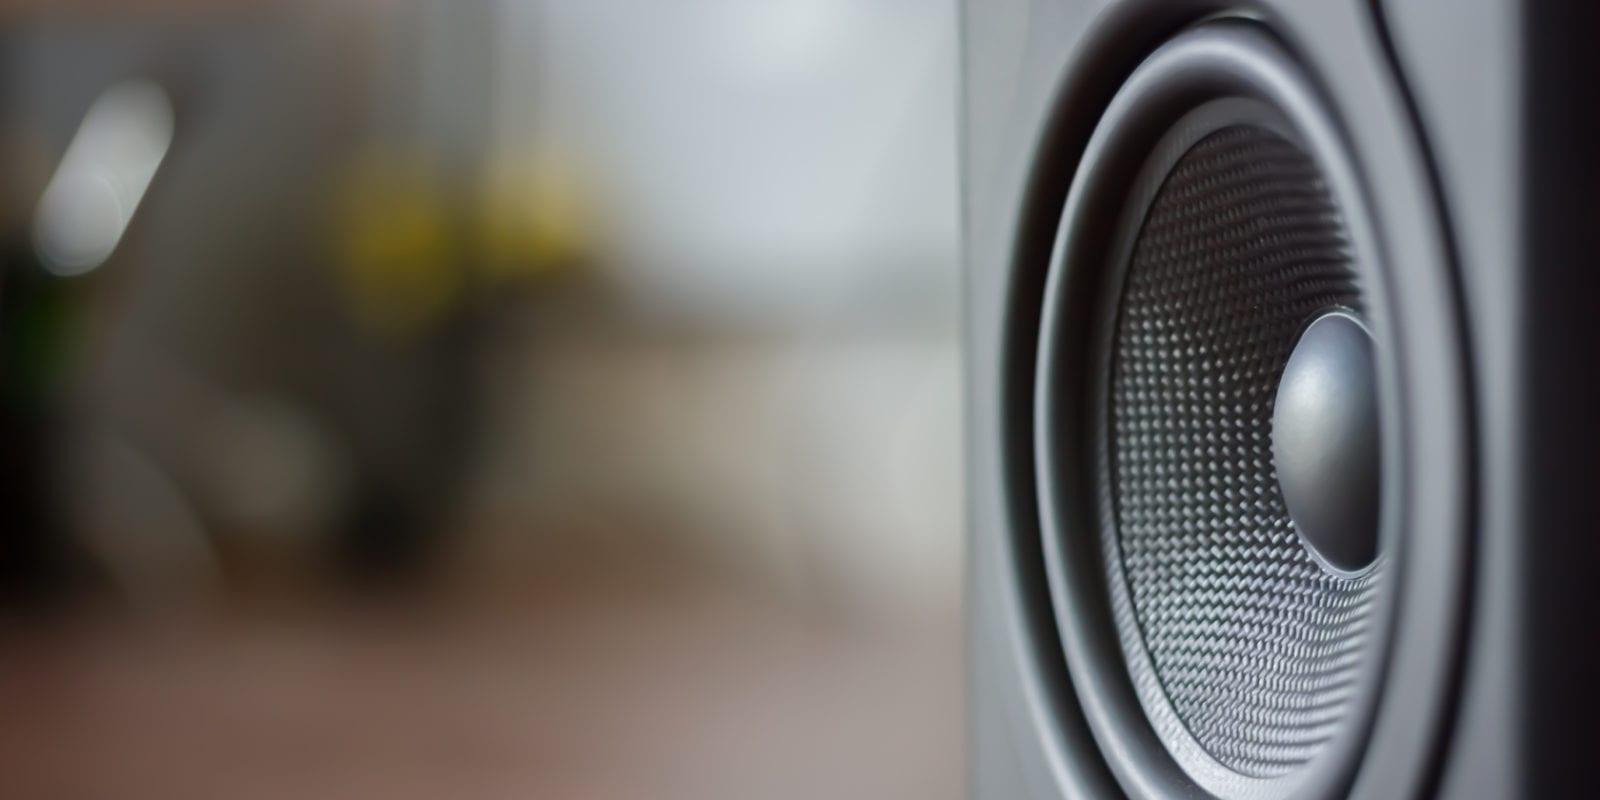 no sound on my computer speakers